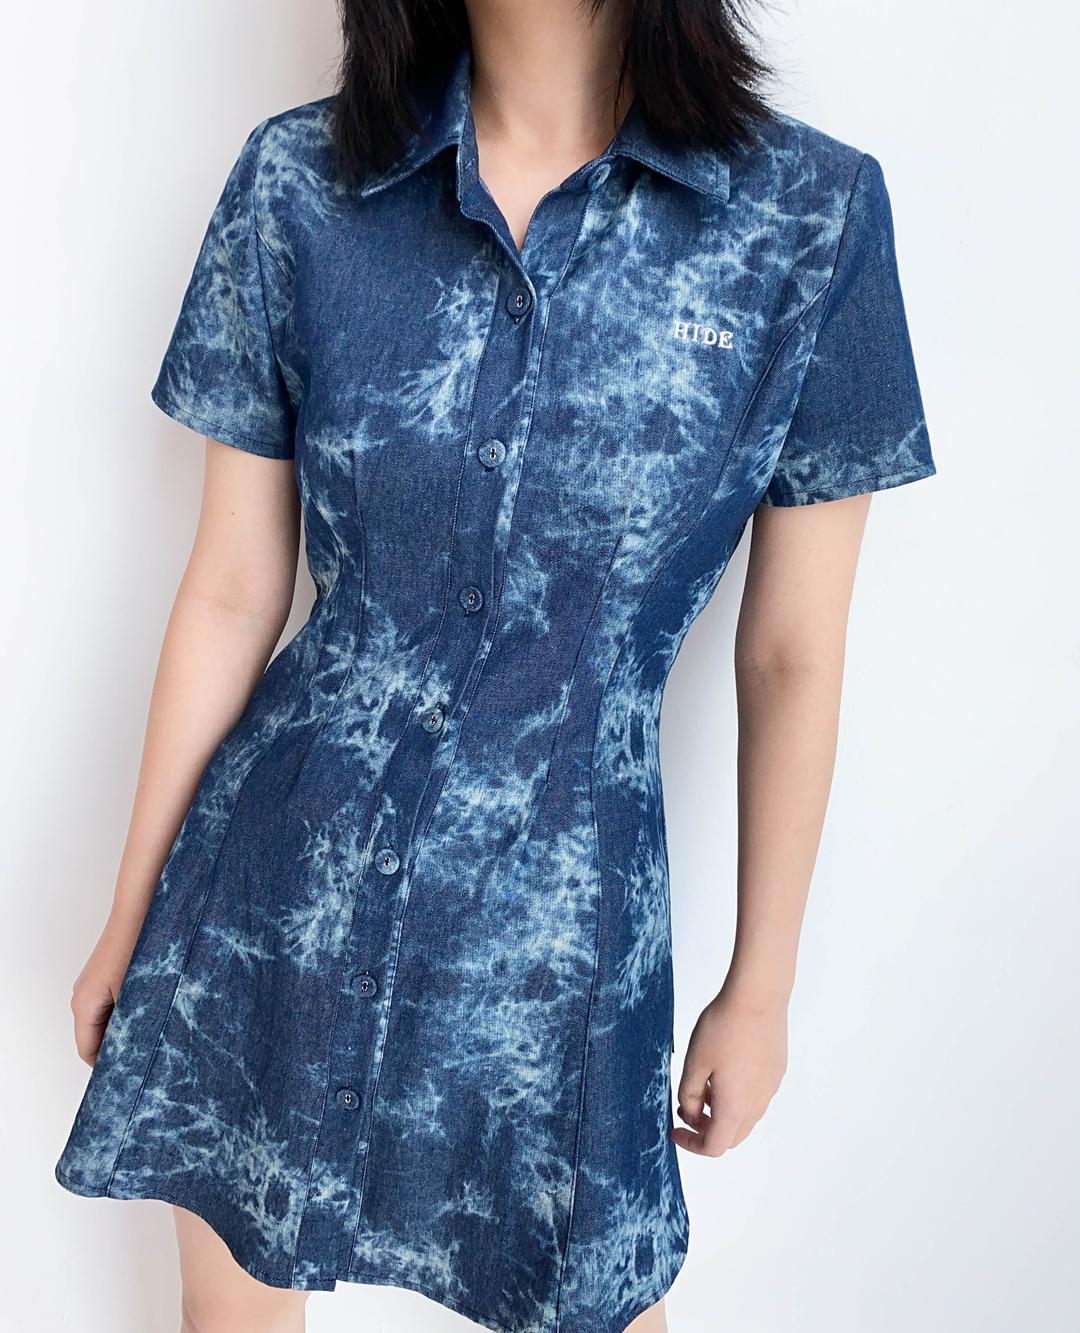 HIDEBlue Tie-Dye Button-Front Dress